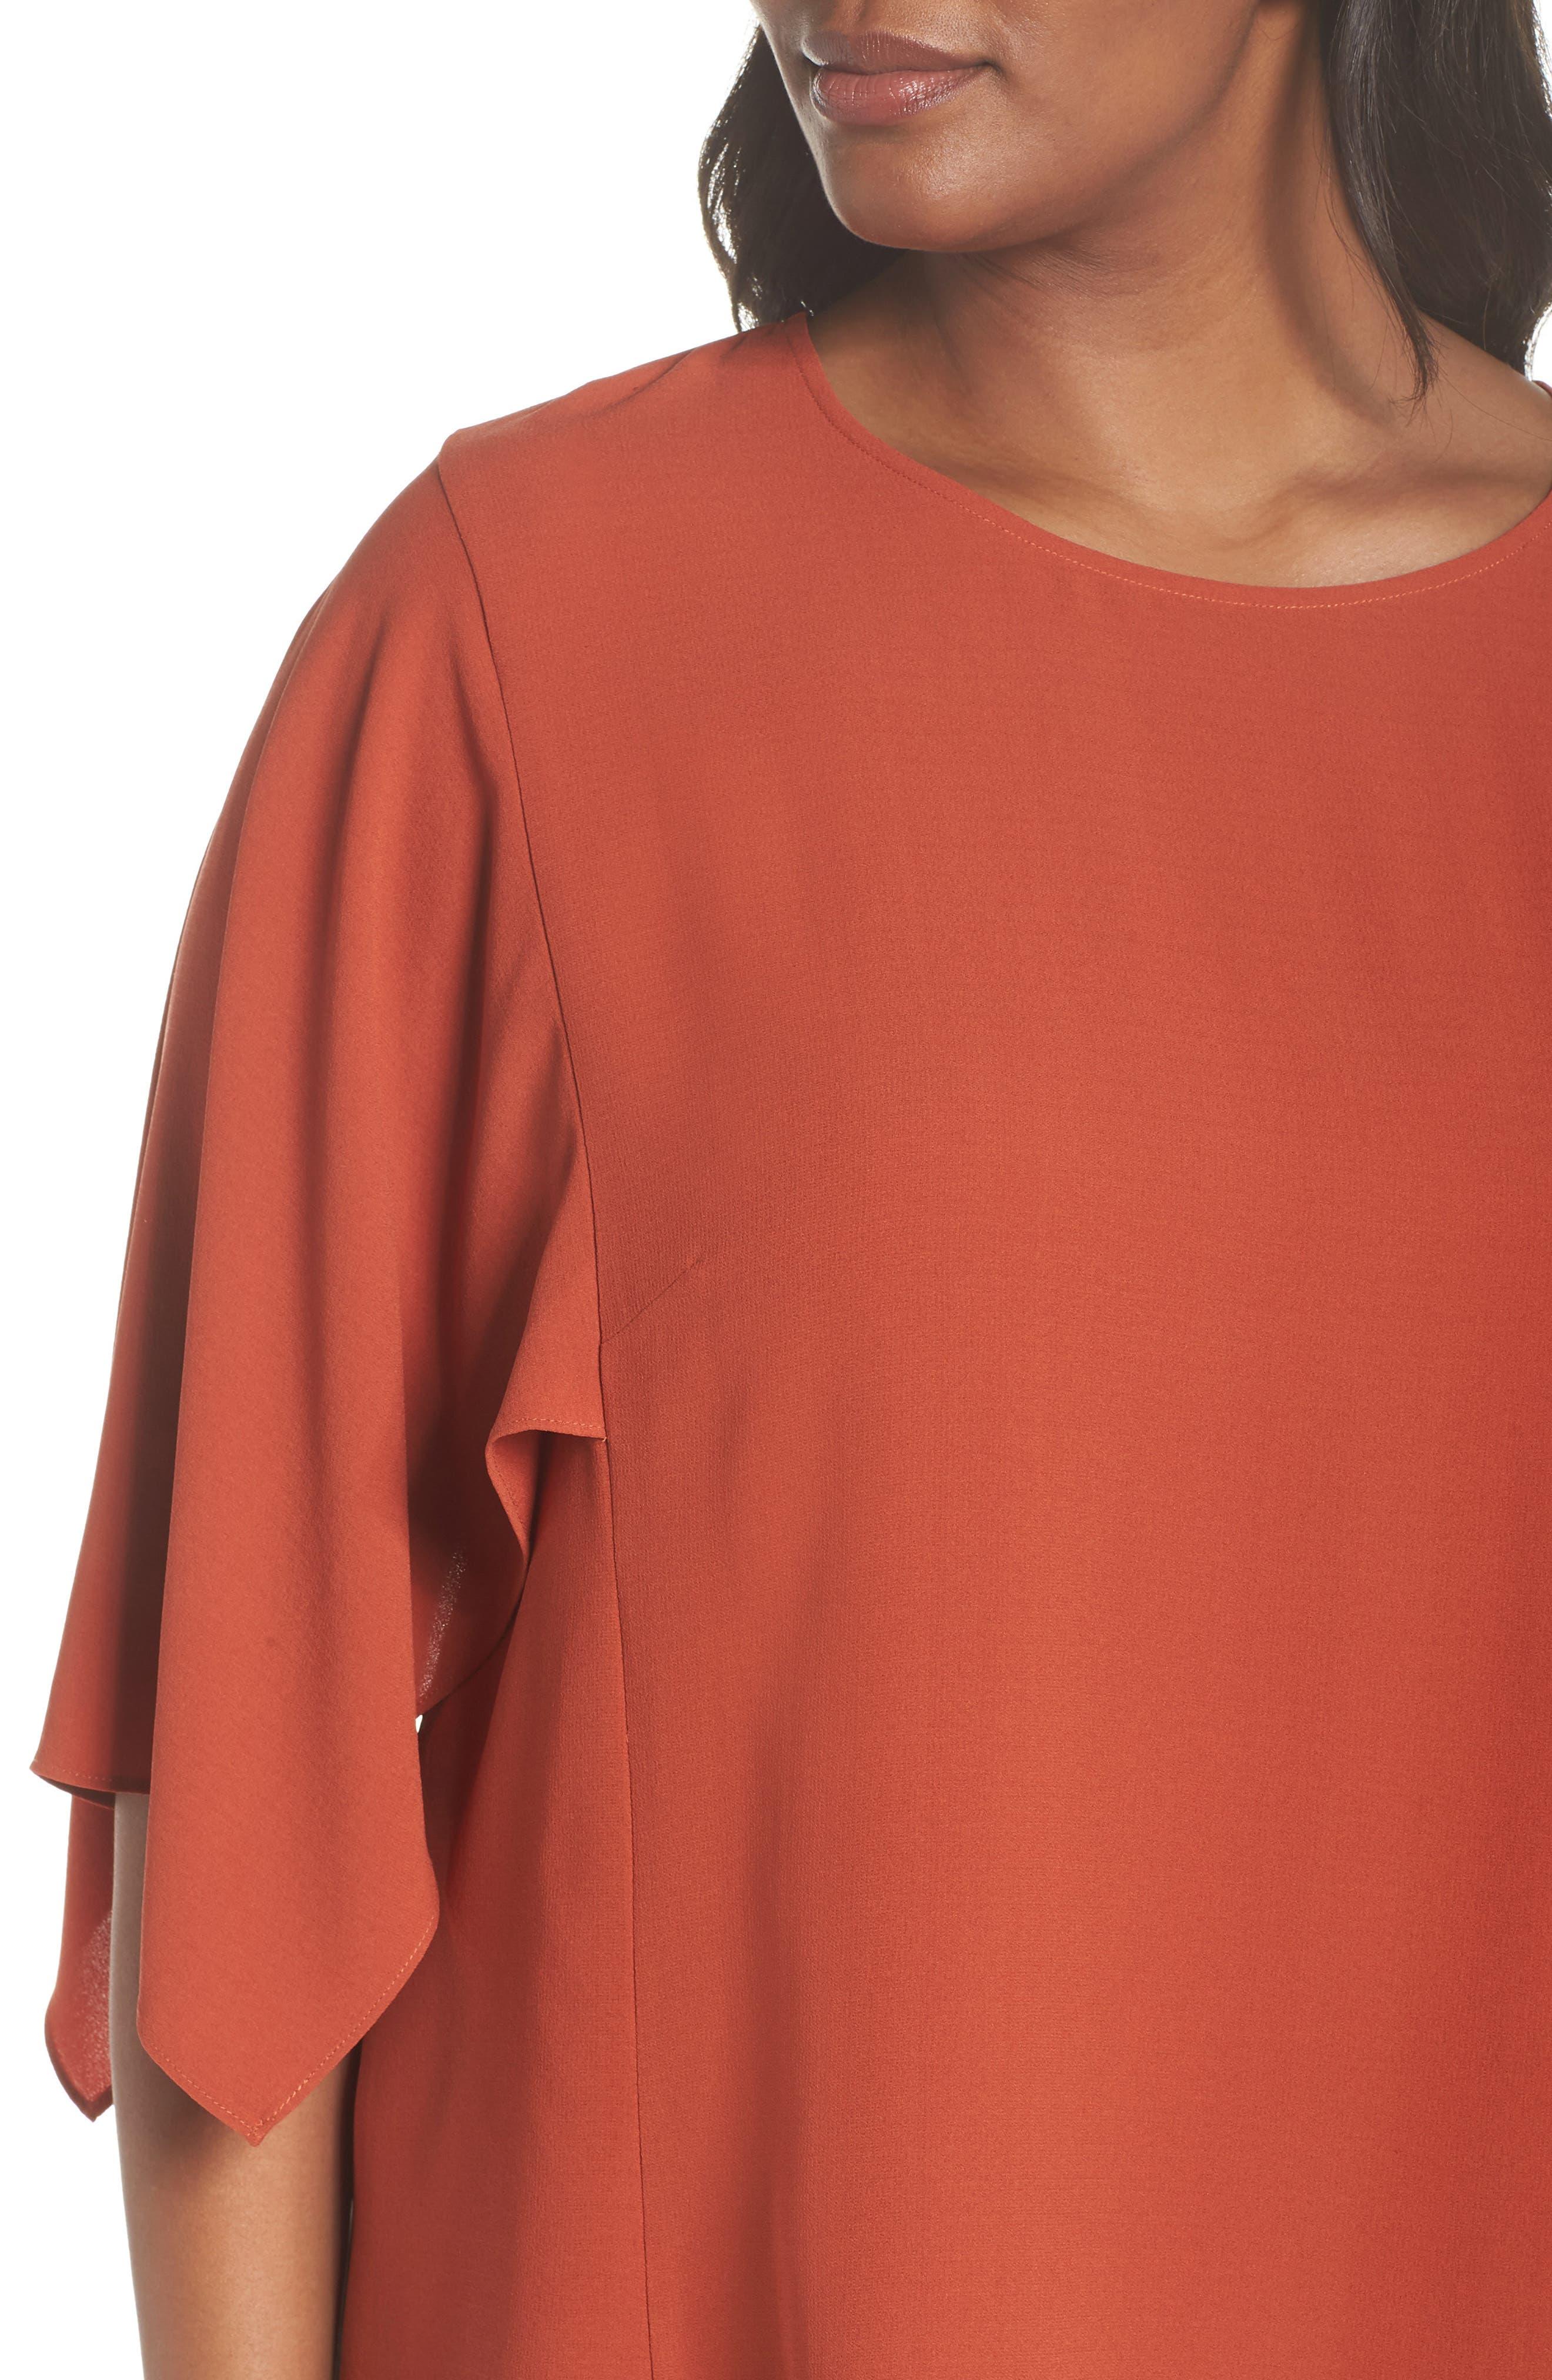 Slit Sleeve Silk Top,                             Alternate thumbnail 3, color,                             Orange Pekoe